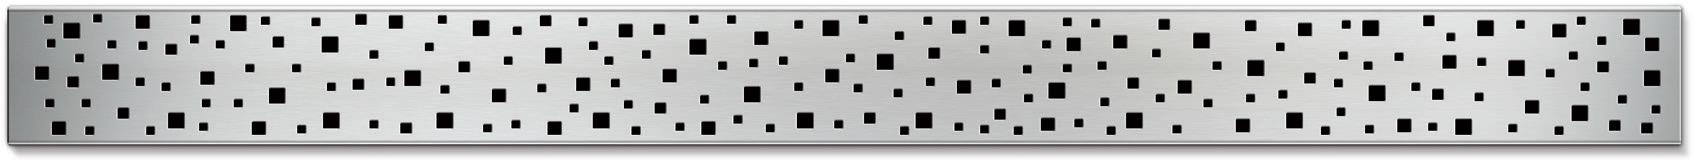 Водоотводящие желоба - square-reshetka-glyanets - miroslav-chudej-s-r-o - 350-x-415 - 1-1 - 1 - 200 - czech-republic